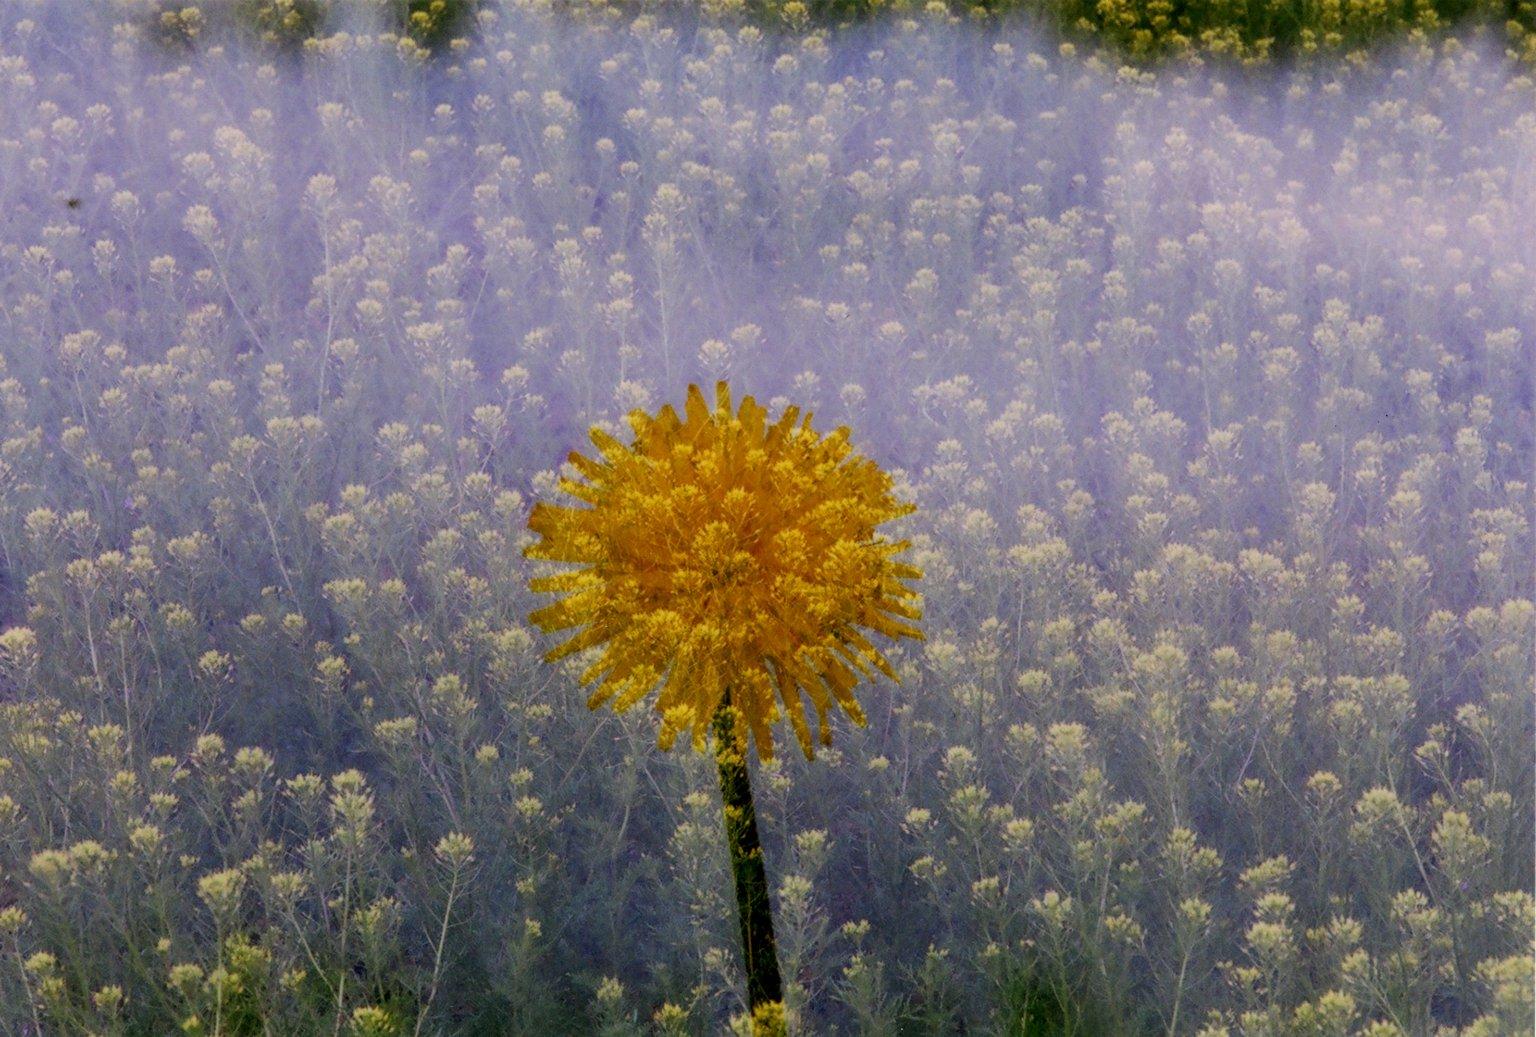 Double Exposure - Dandelion over yellow flowers